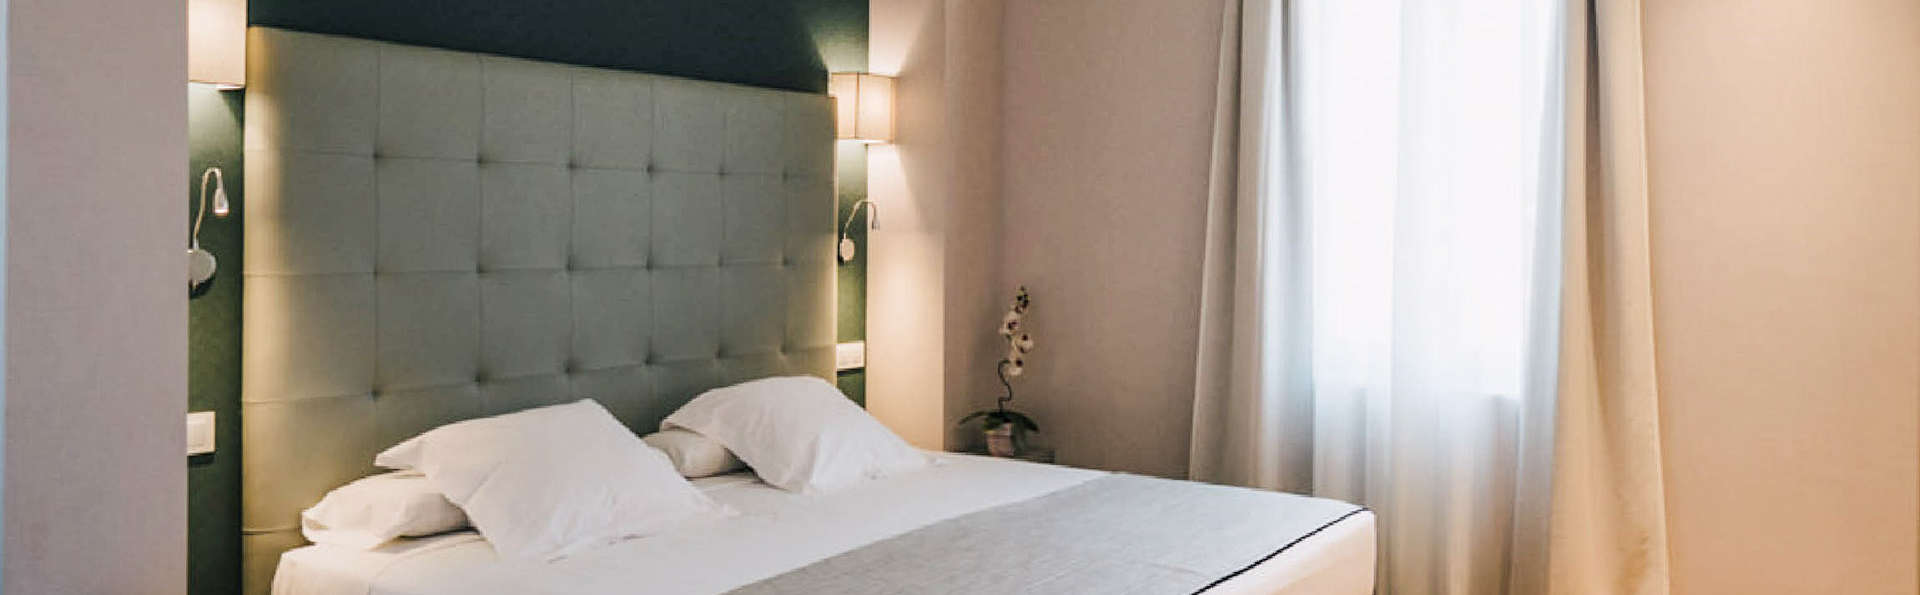 Hotel Torrelodones - EDIT_FOTO_CASITA_02.jpg